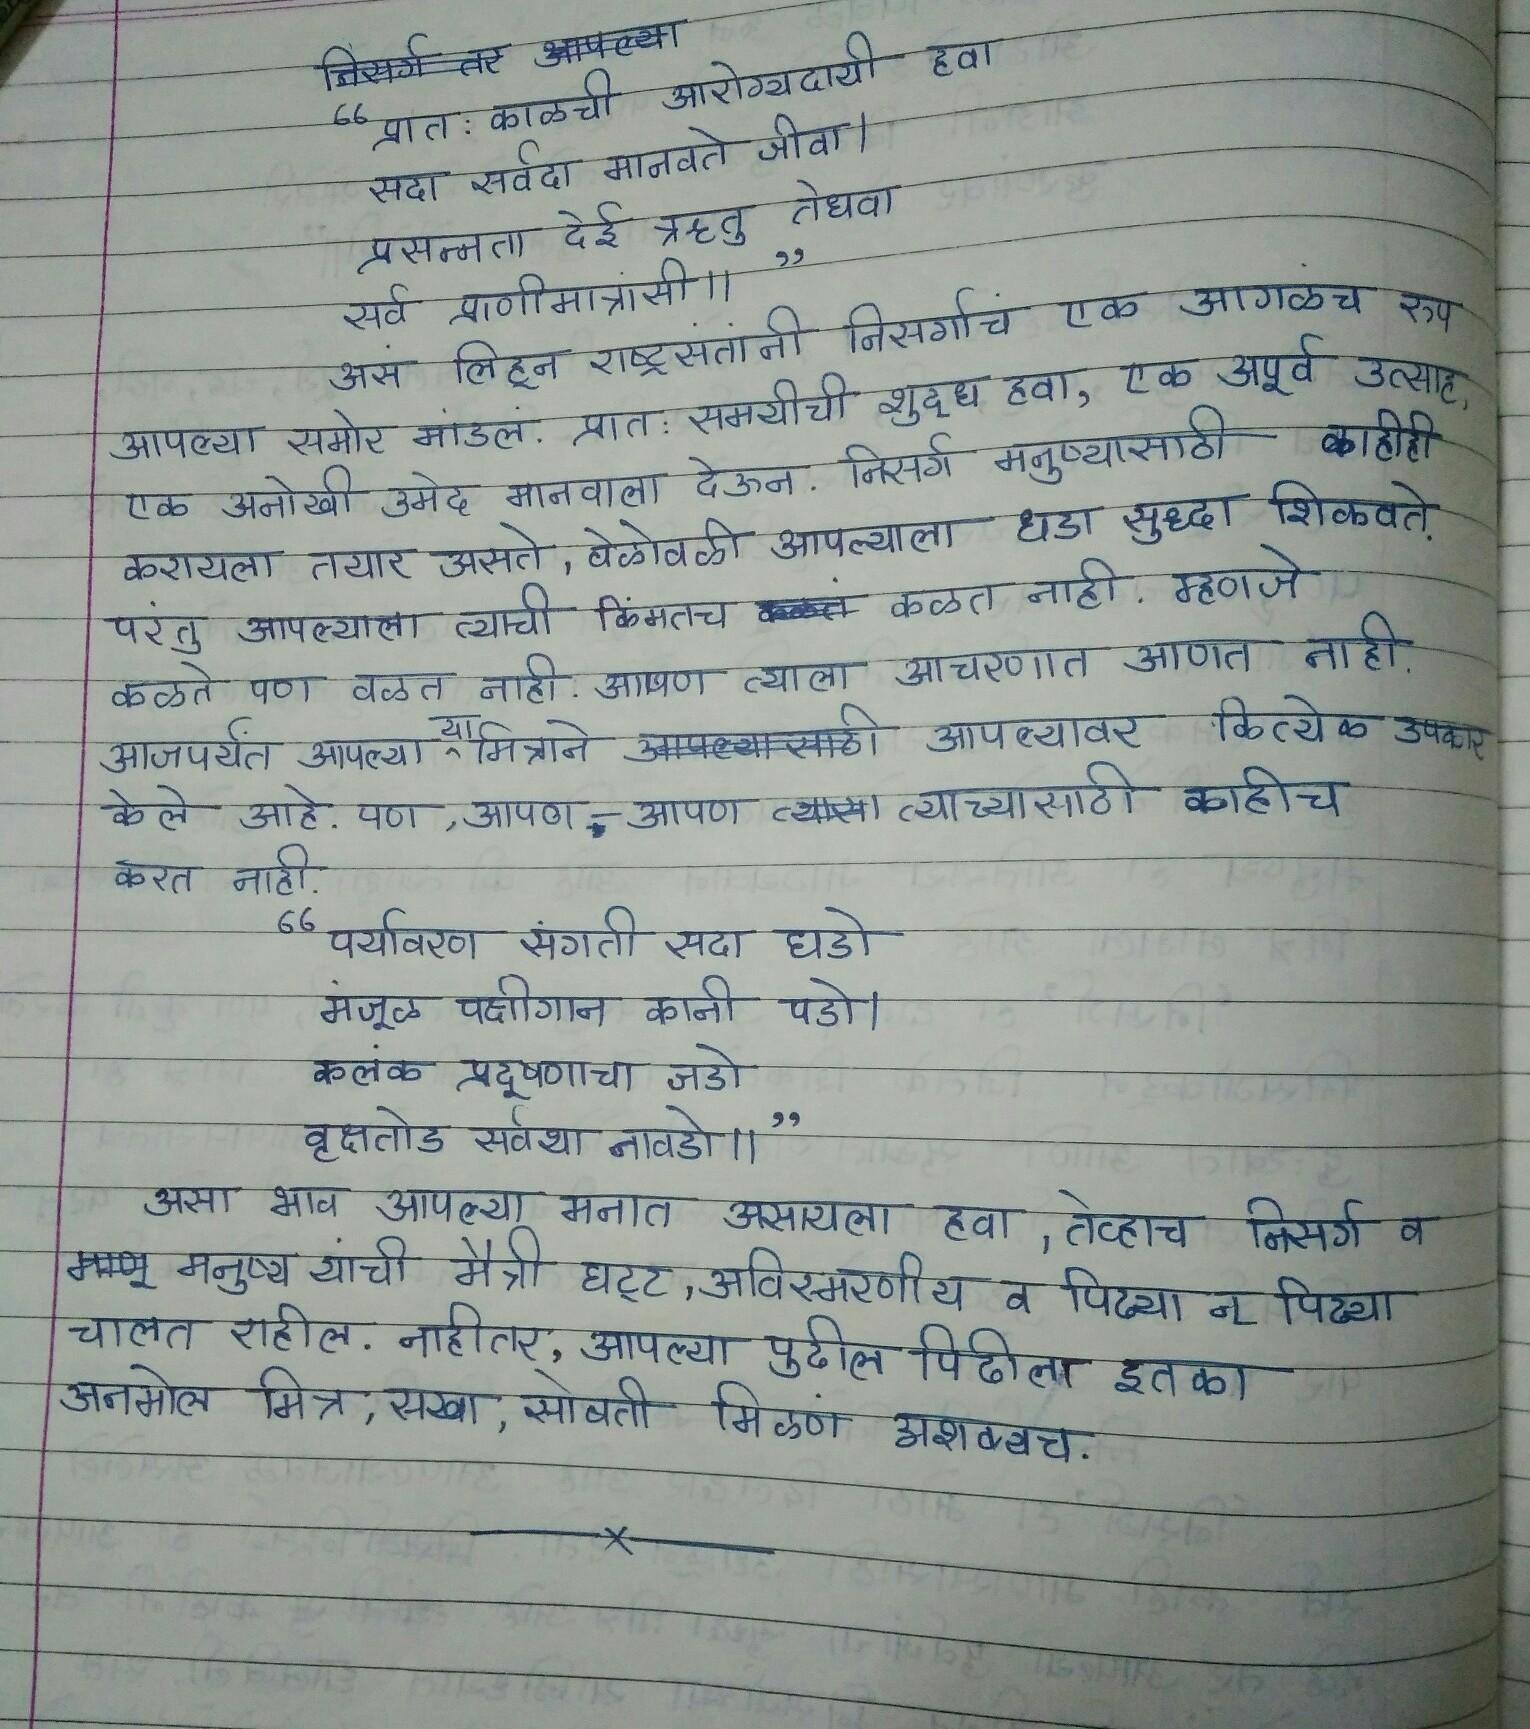 nisarg maza sobti essay in marathi - Brainly in